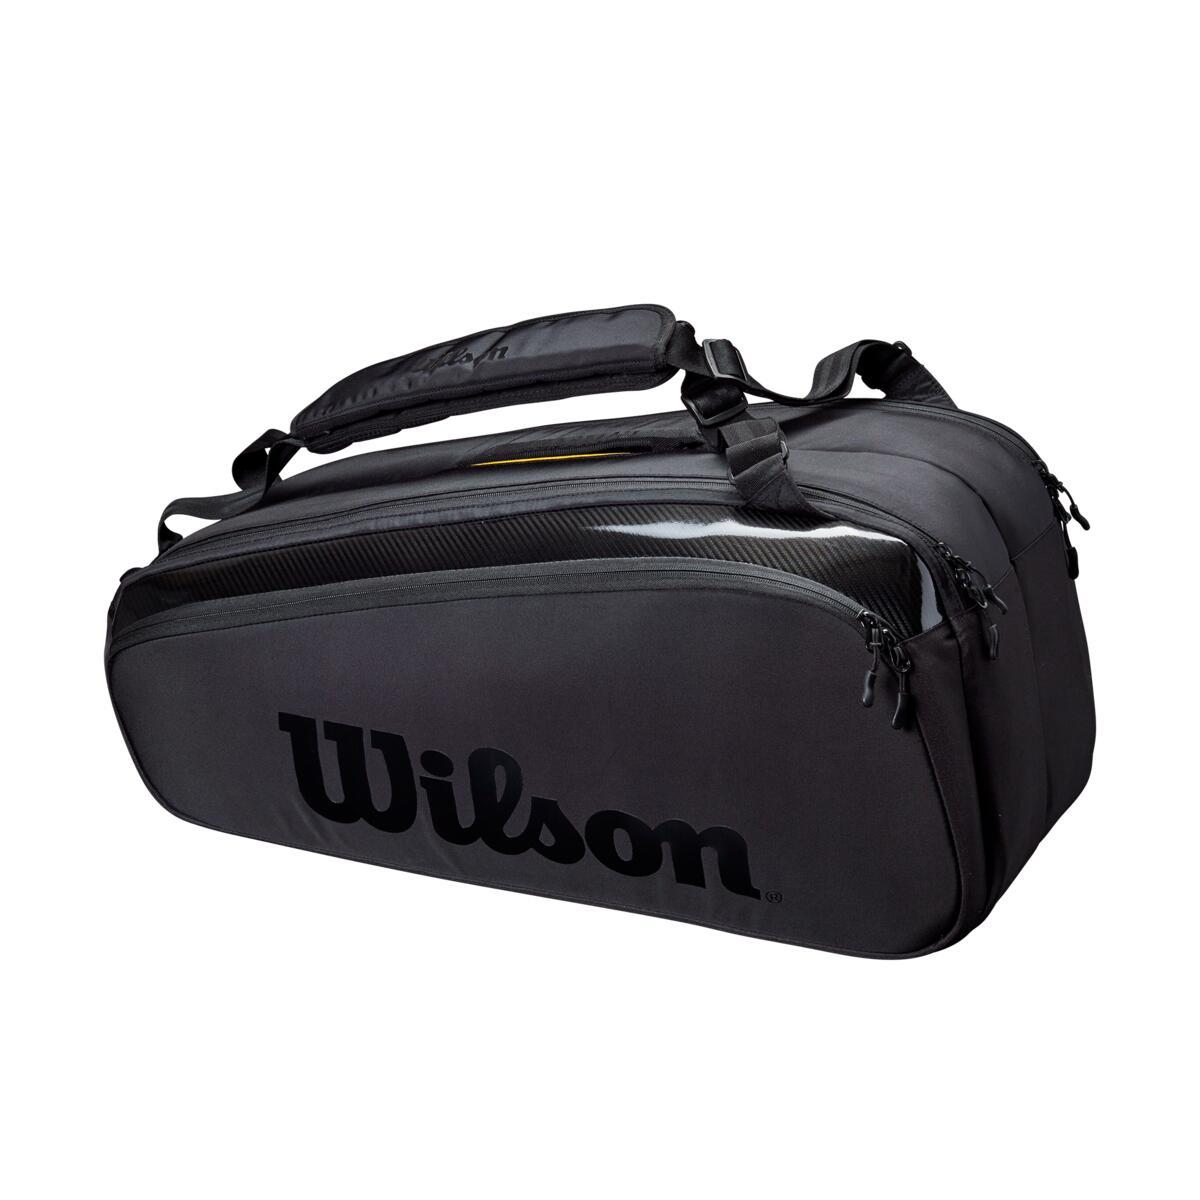 Wilson Super Tour 9 Pack Tennis Bag – Black 2021